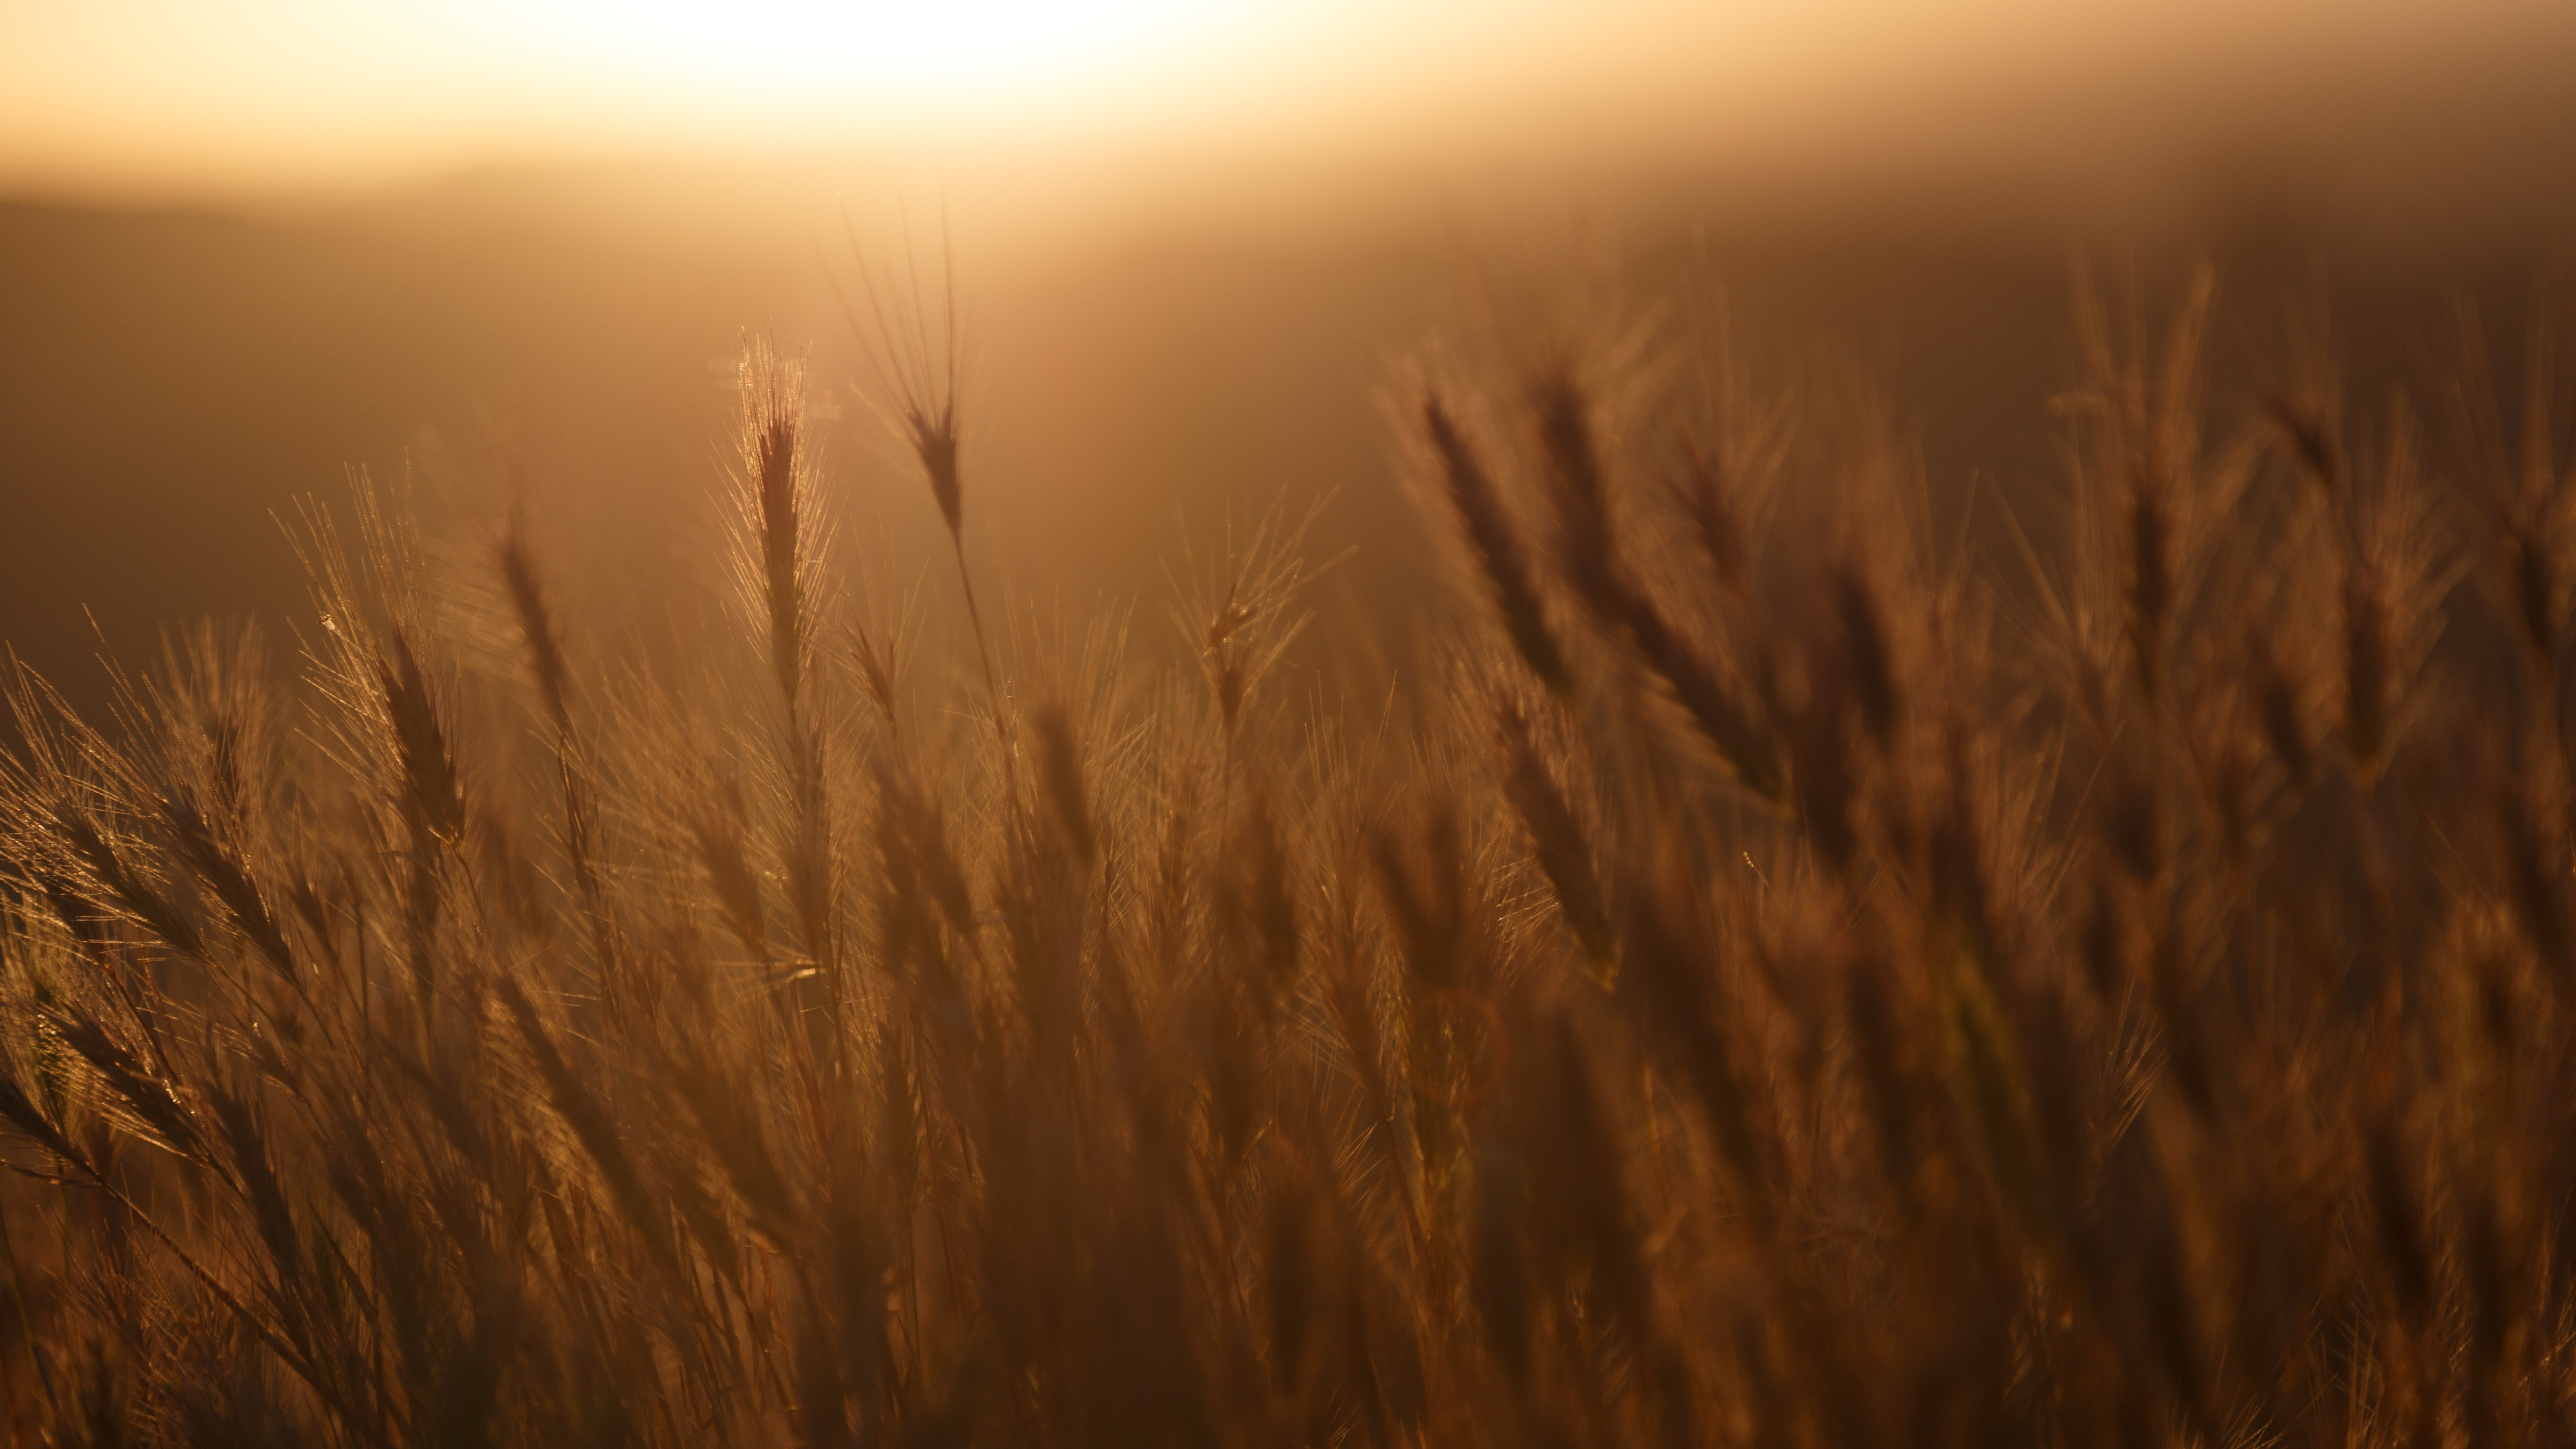 Field gilded by the sun, sun, sunlight, corn, evening, sunset, libertard, outside, nature